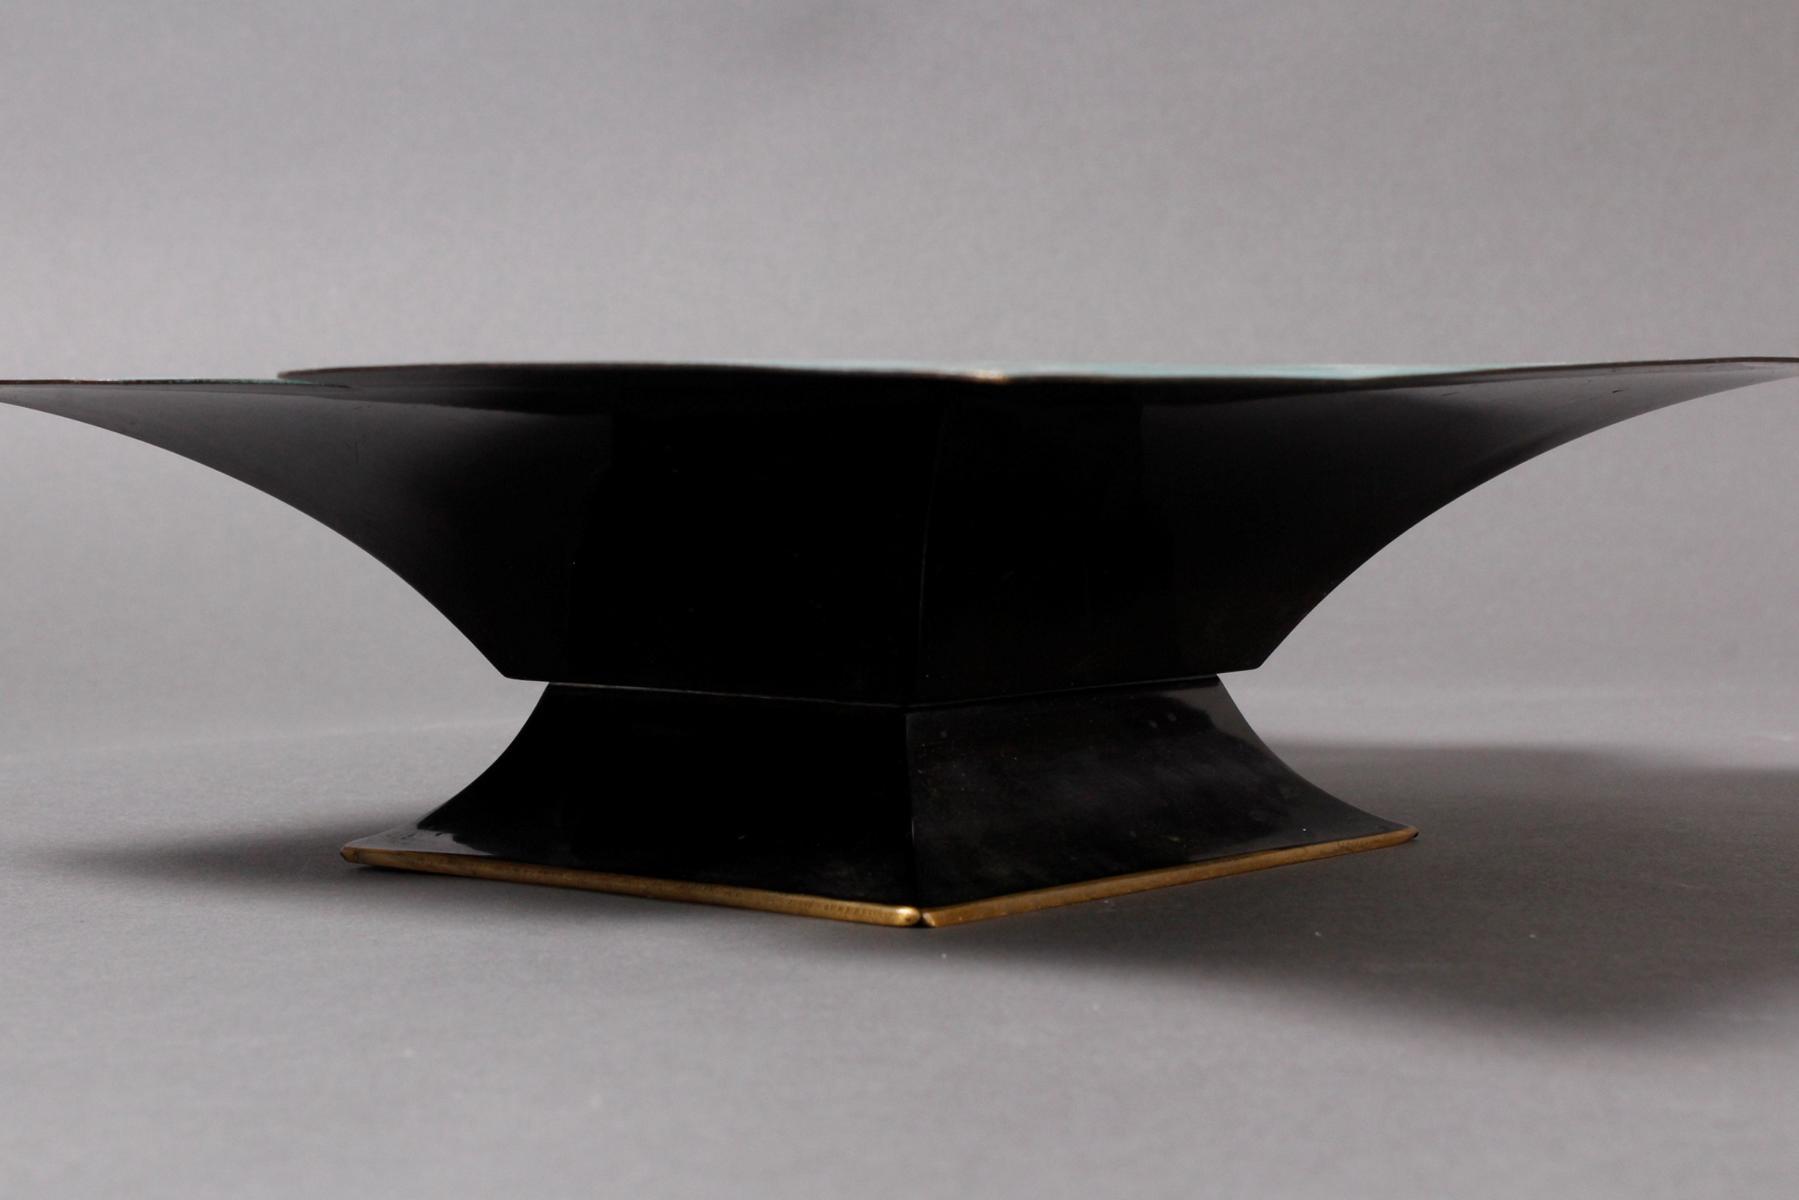 Messingzierschale WMF Ikora um 1925, Paul Haustein-3